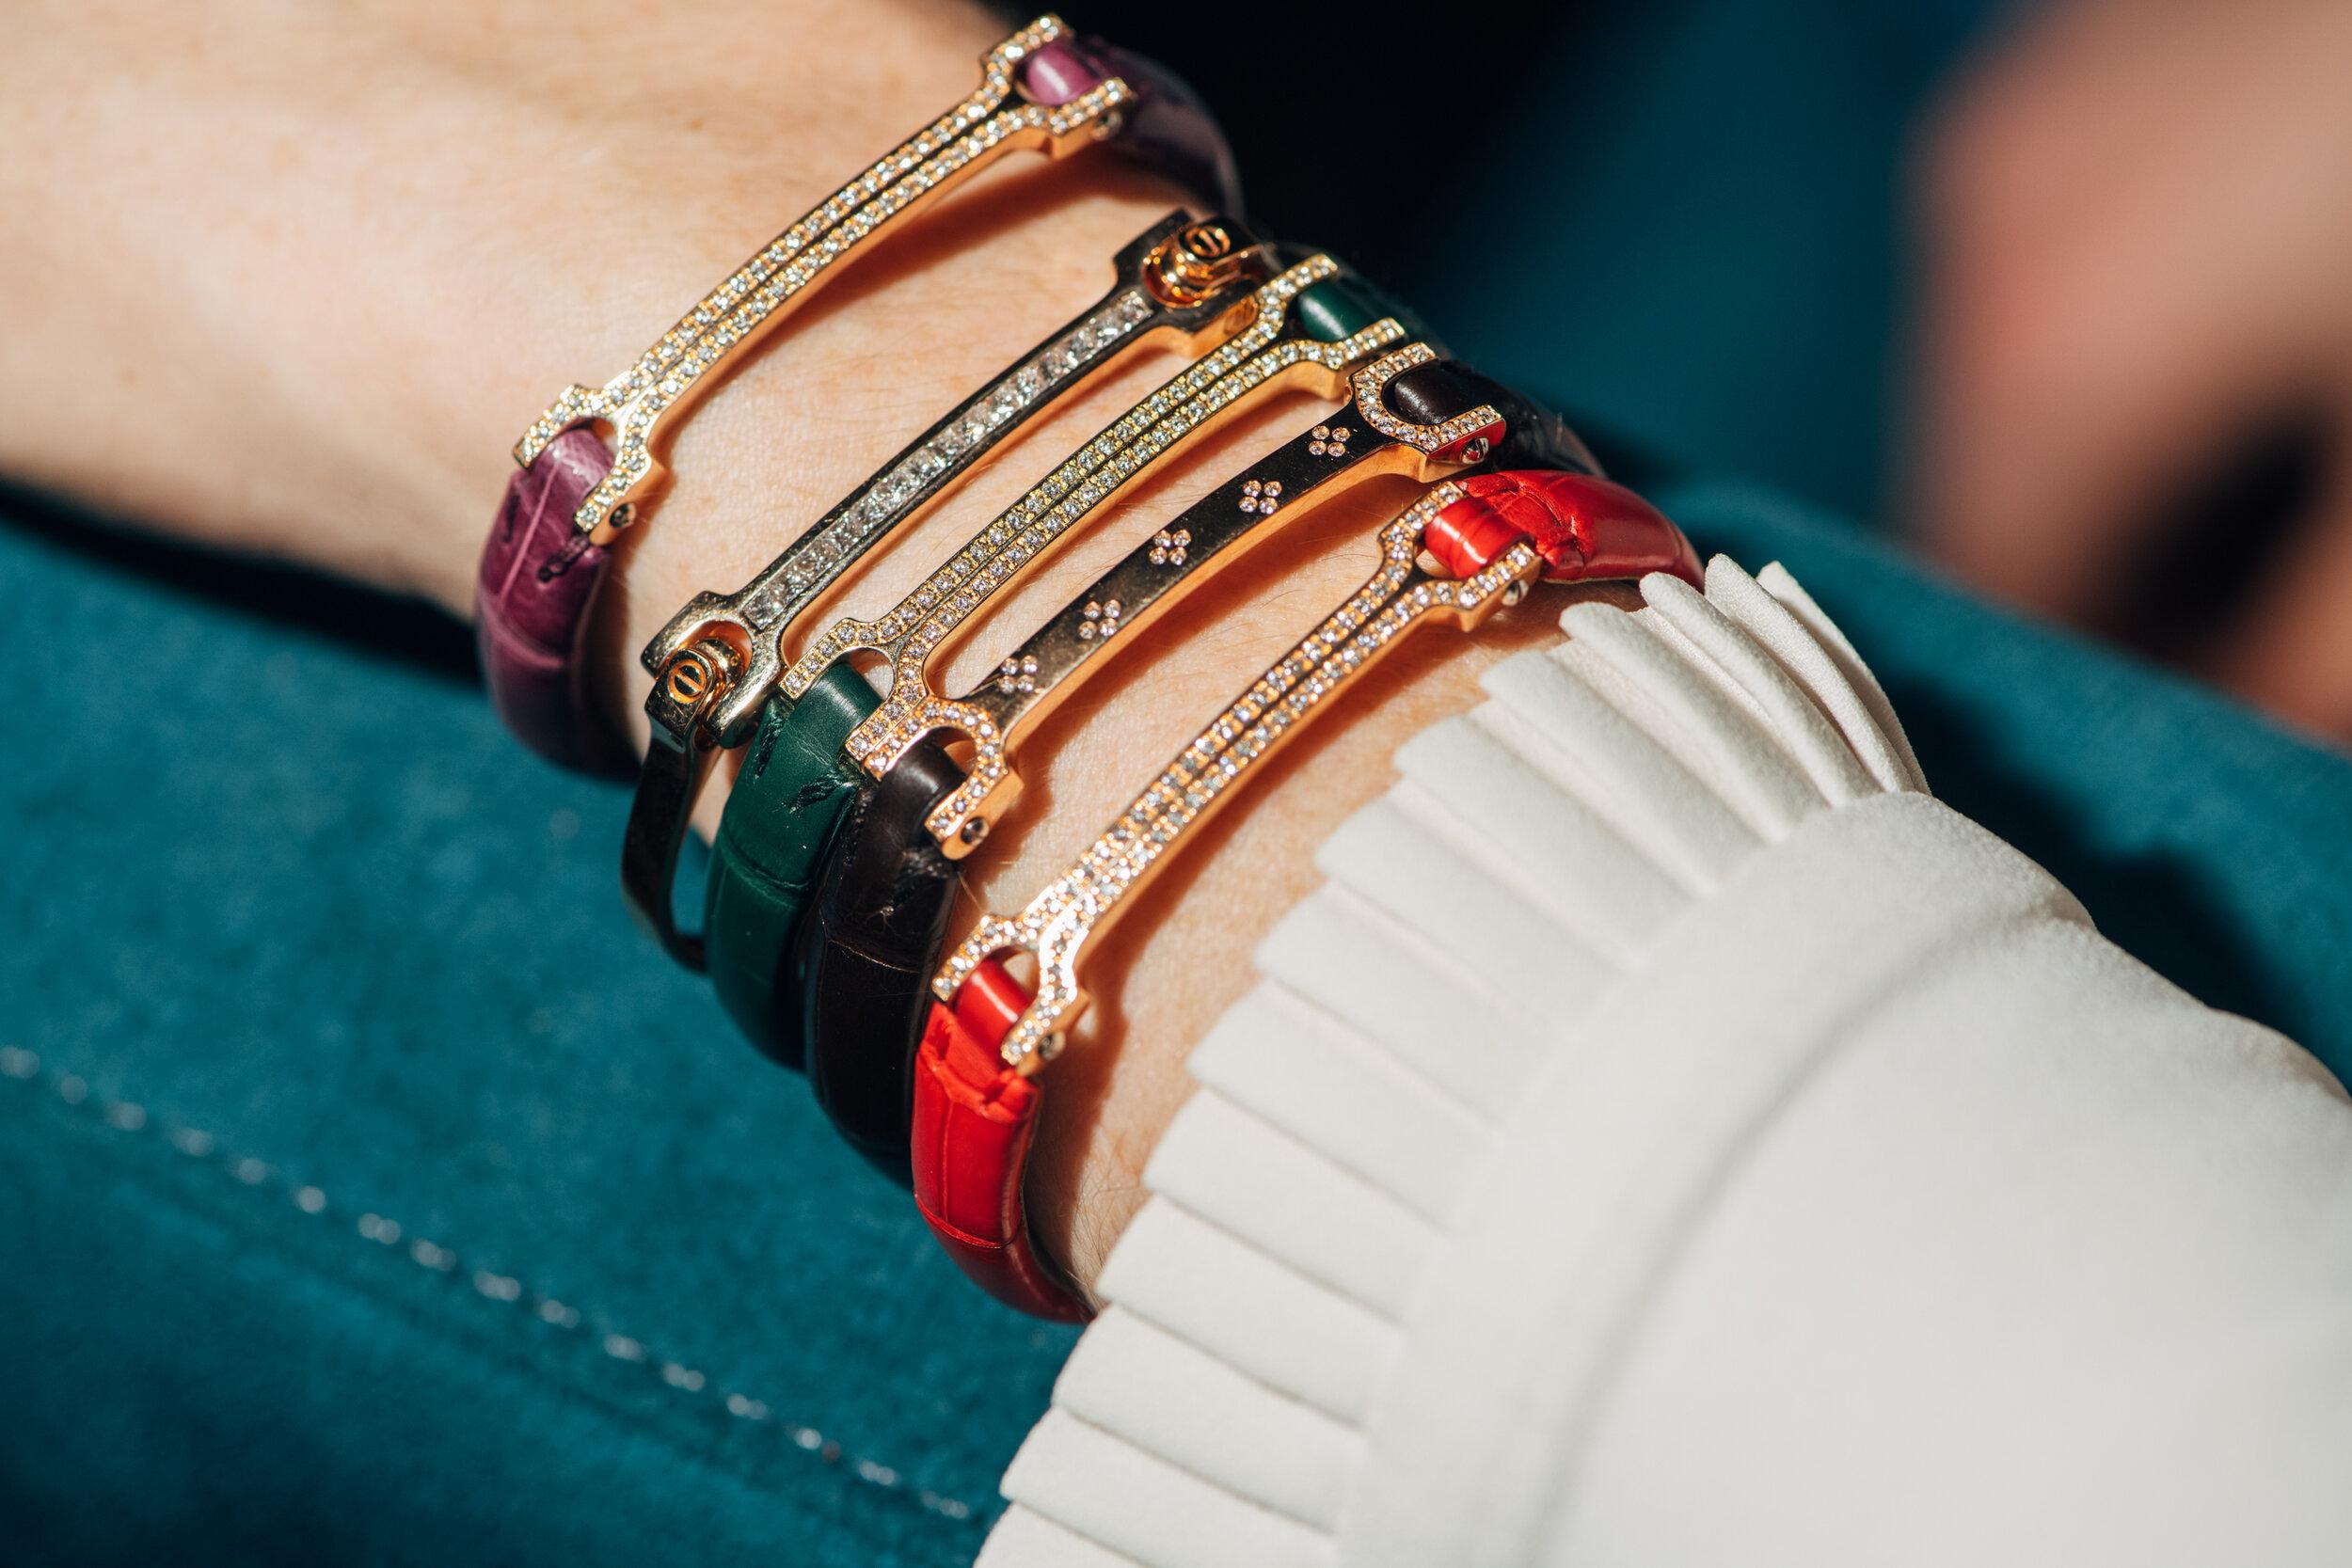 Shop all Matthia's & Claire 18K Gold & Diamond Skin Bracelets, starting at $4,200